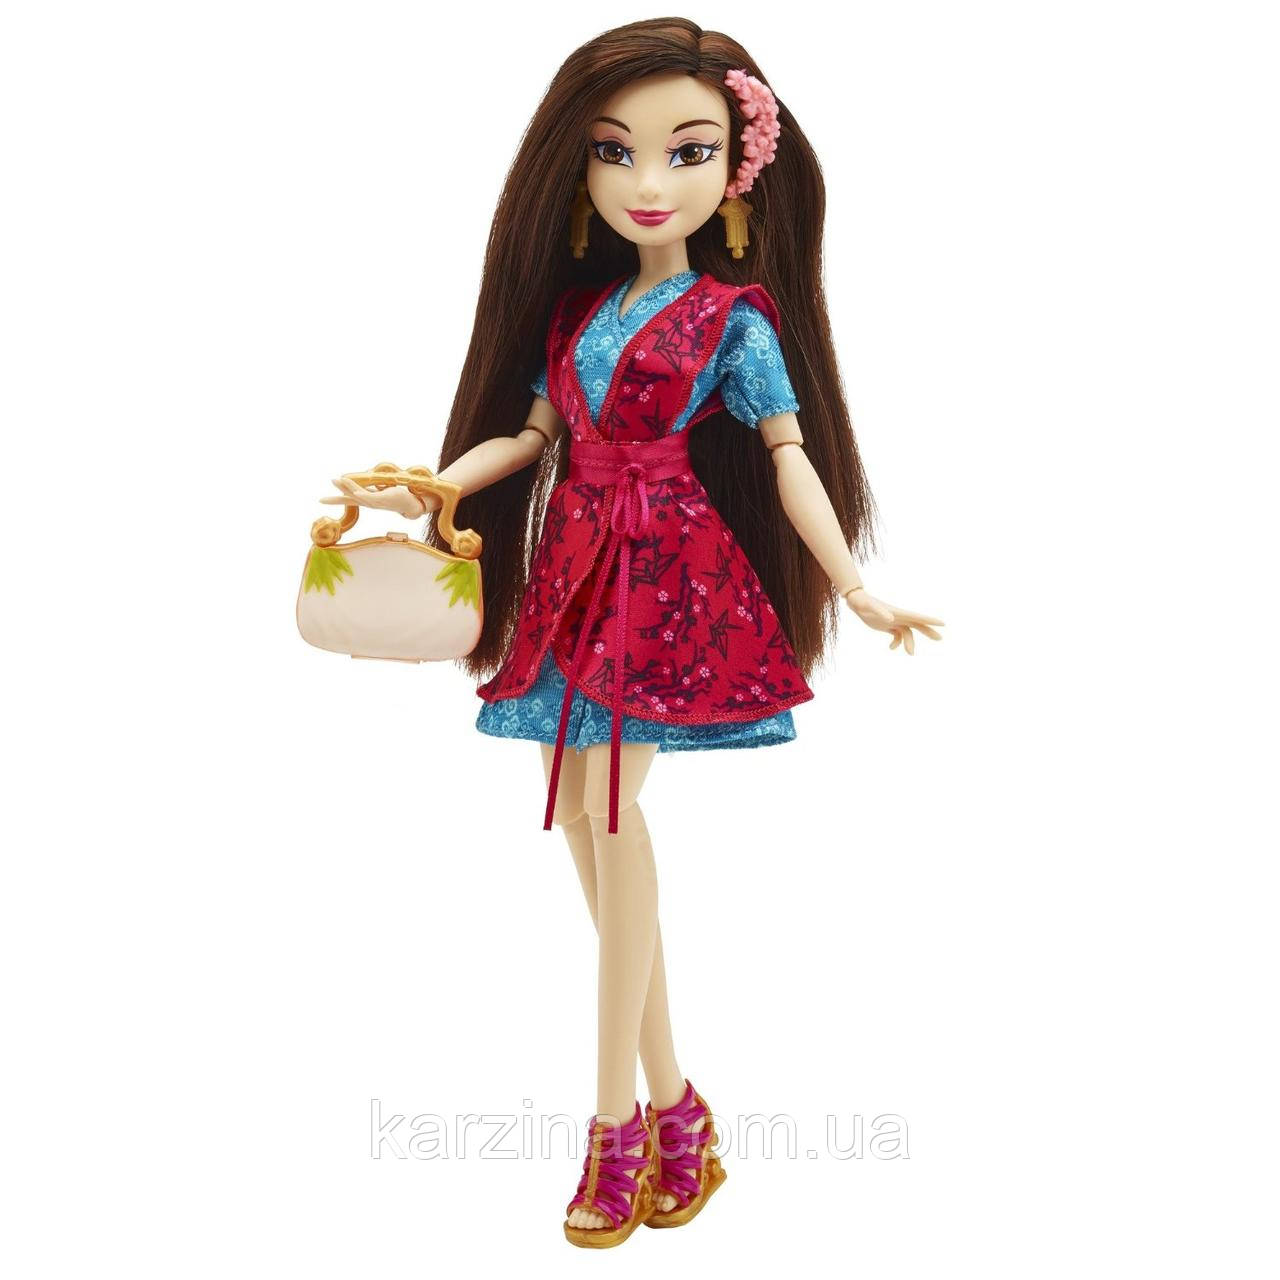 Кукла Лонни (Lonnie) День семьи Наследники Hasbro Disney